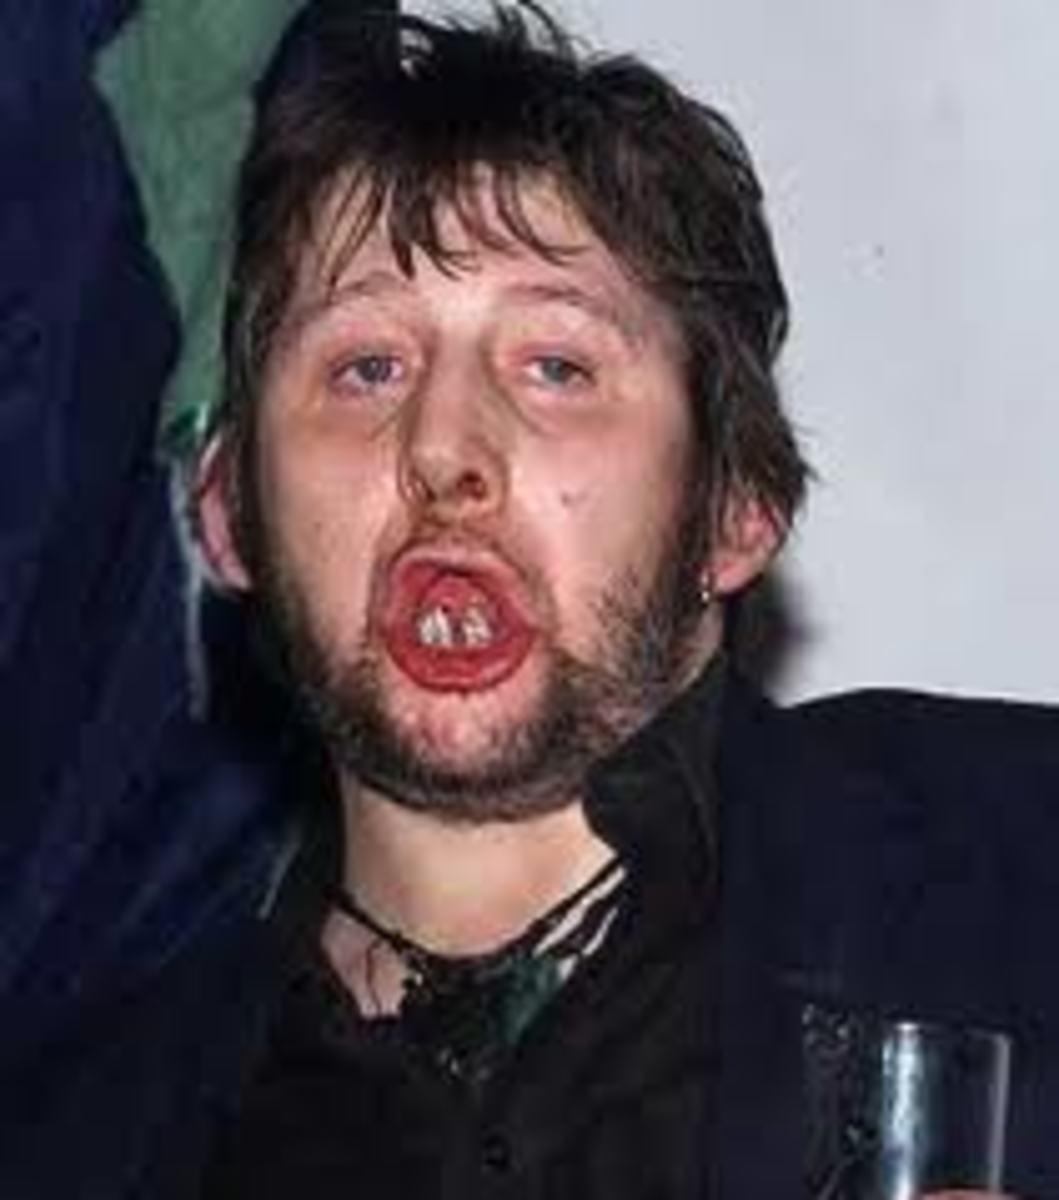 To be fair, Shane MacGowan lately has a brand new set of teeth.